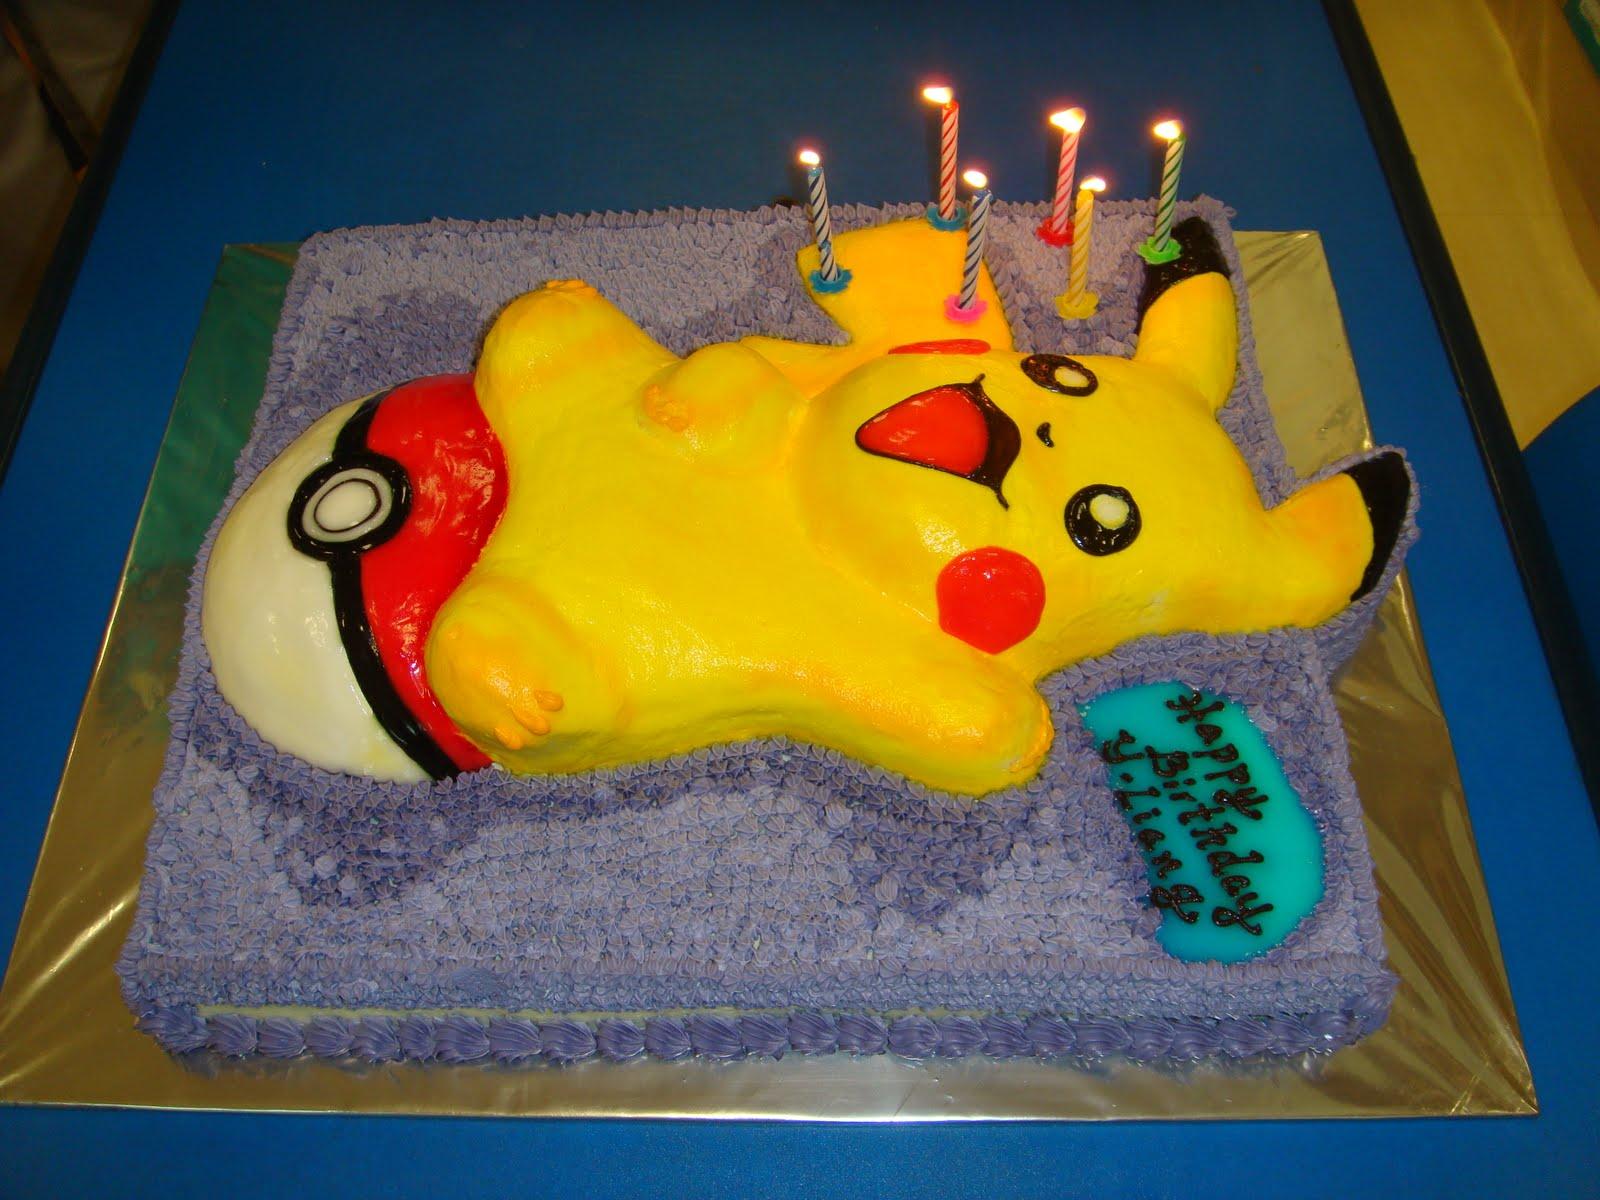 Yummy Baking Pokemon Pikachu Fresh Cream Cake